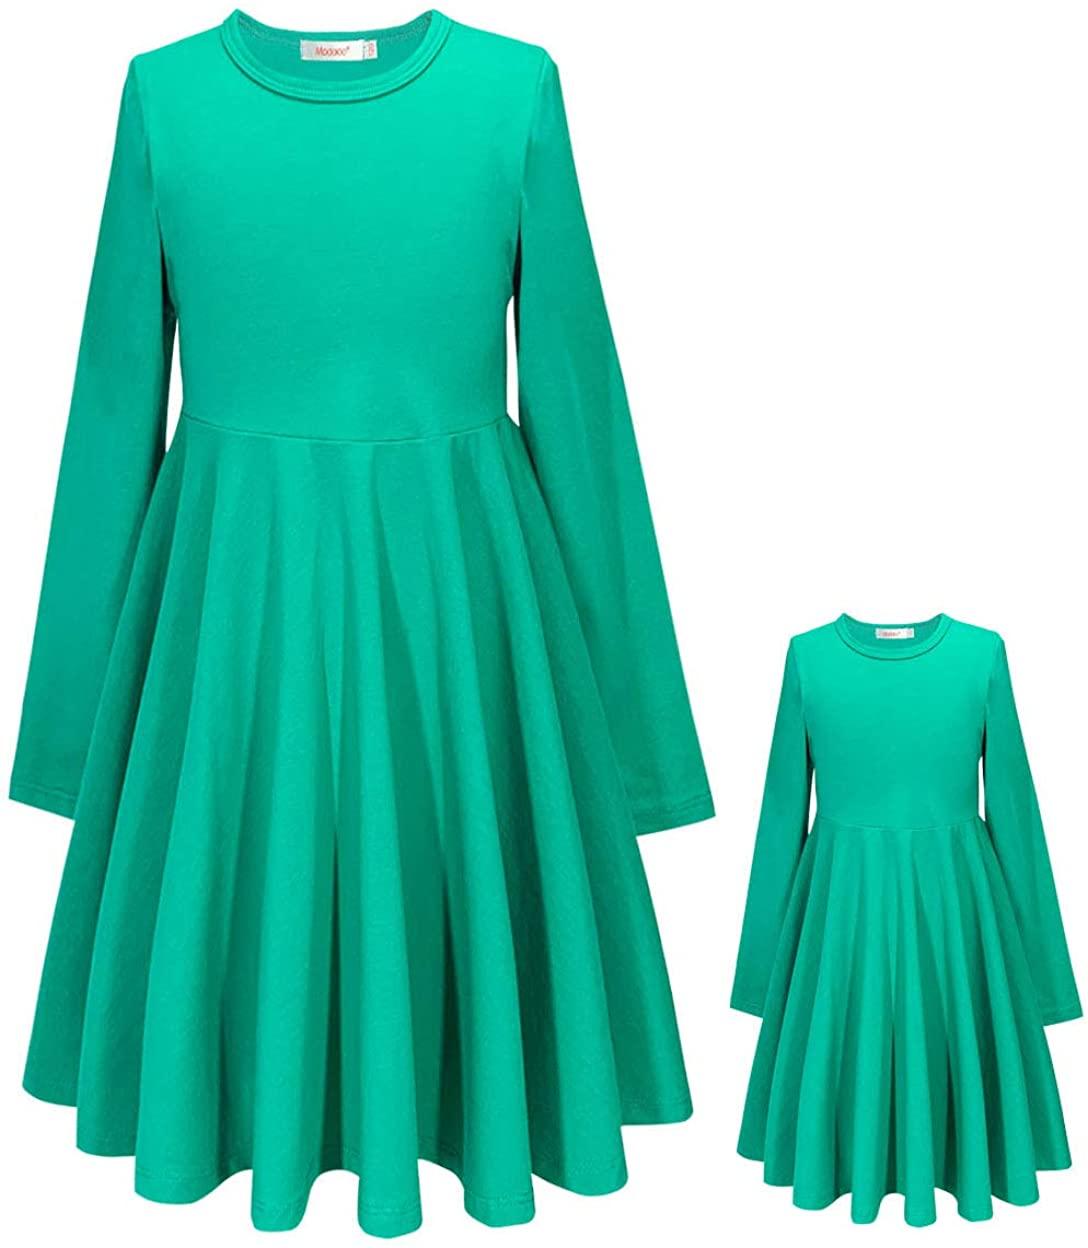 ModaIOO Matching Dolls & Girls Long Sleeve Dress,A-Line Skater Twirly Casual Dresses for Kids